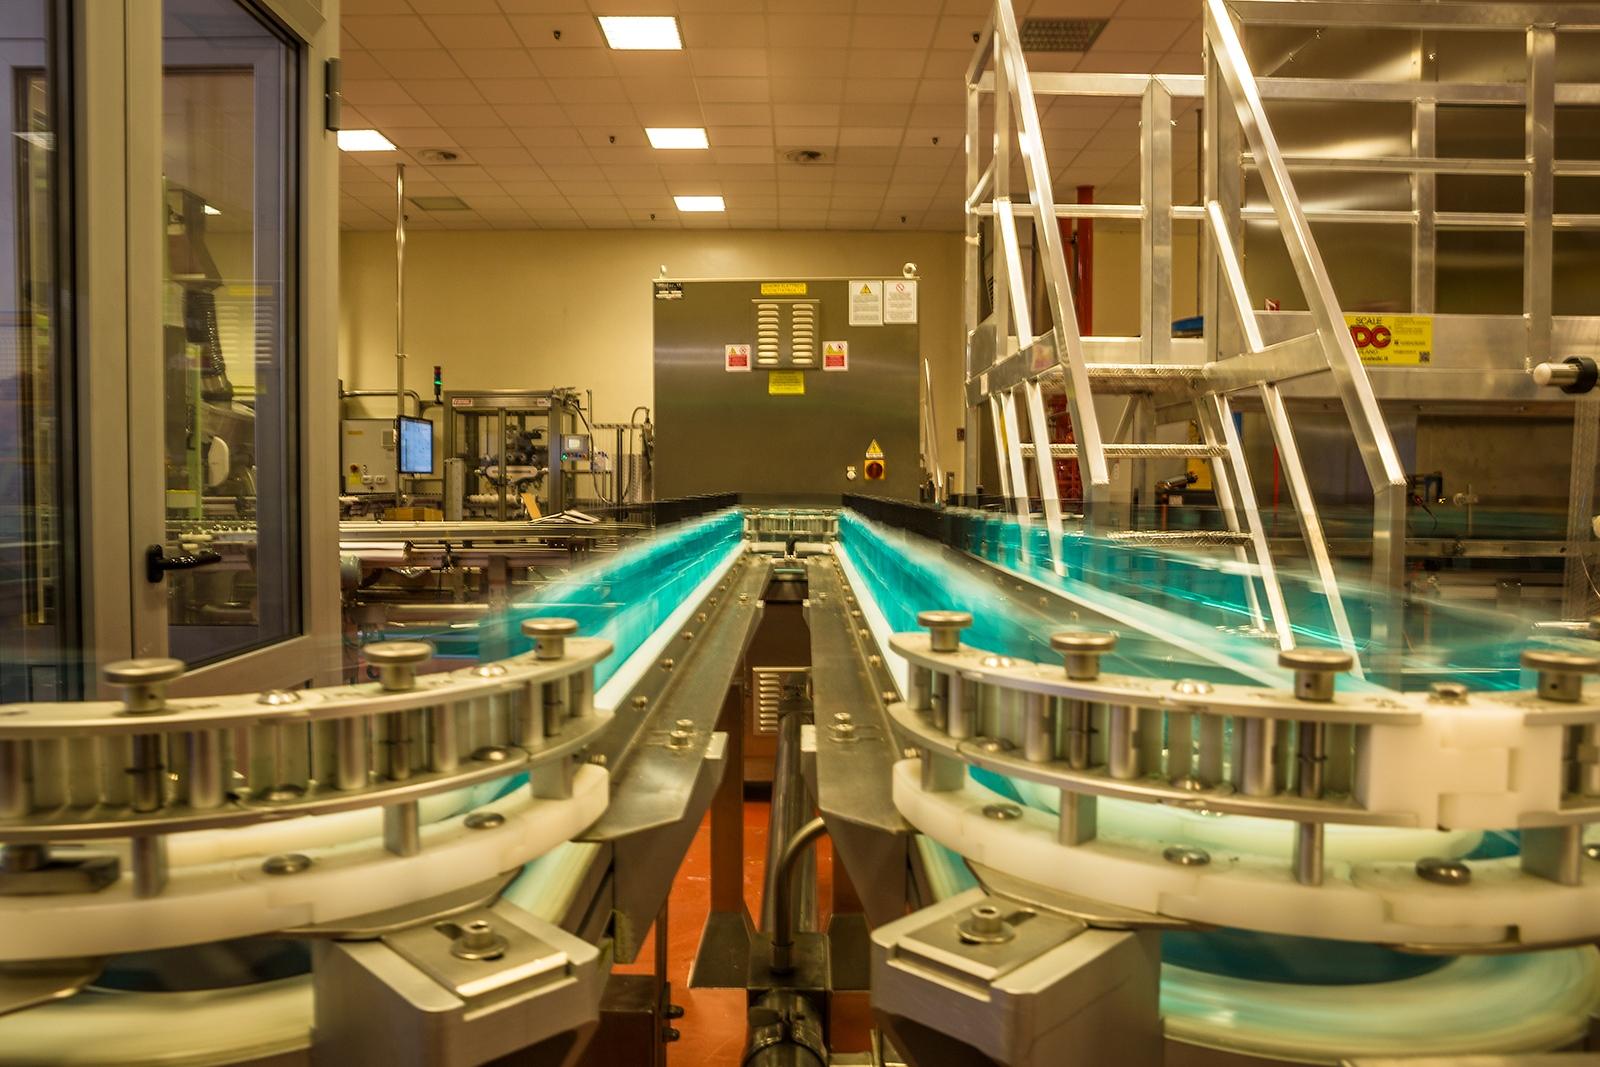 Johnson & Johnson plant production of mouthwash bottles on a conveyor belt